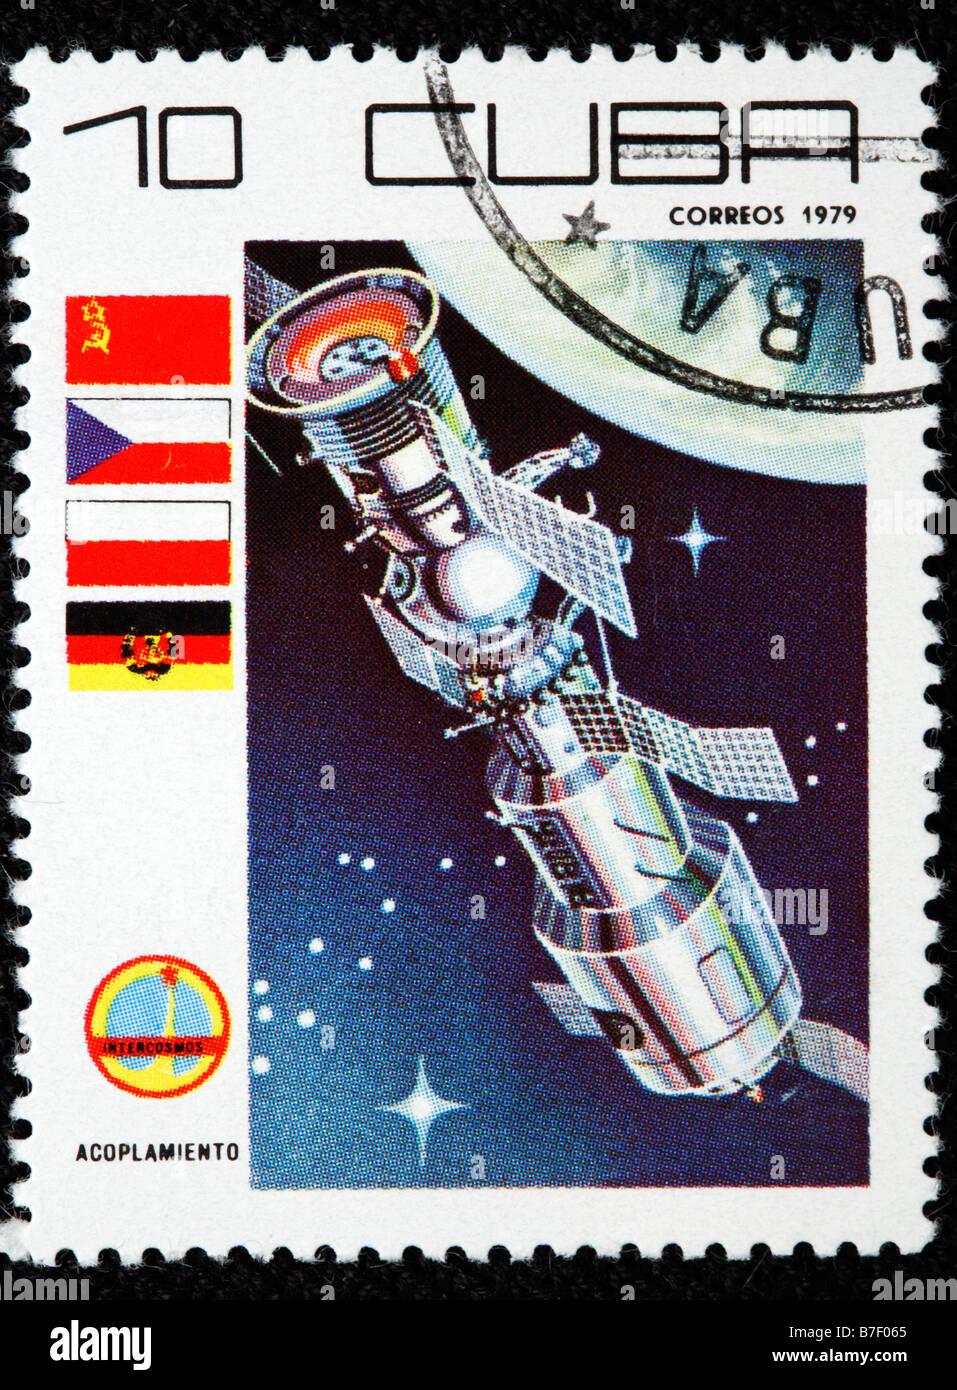 Soviet space orbital station, postage stamp, Cuba, 1979 - Stock Image